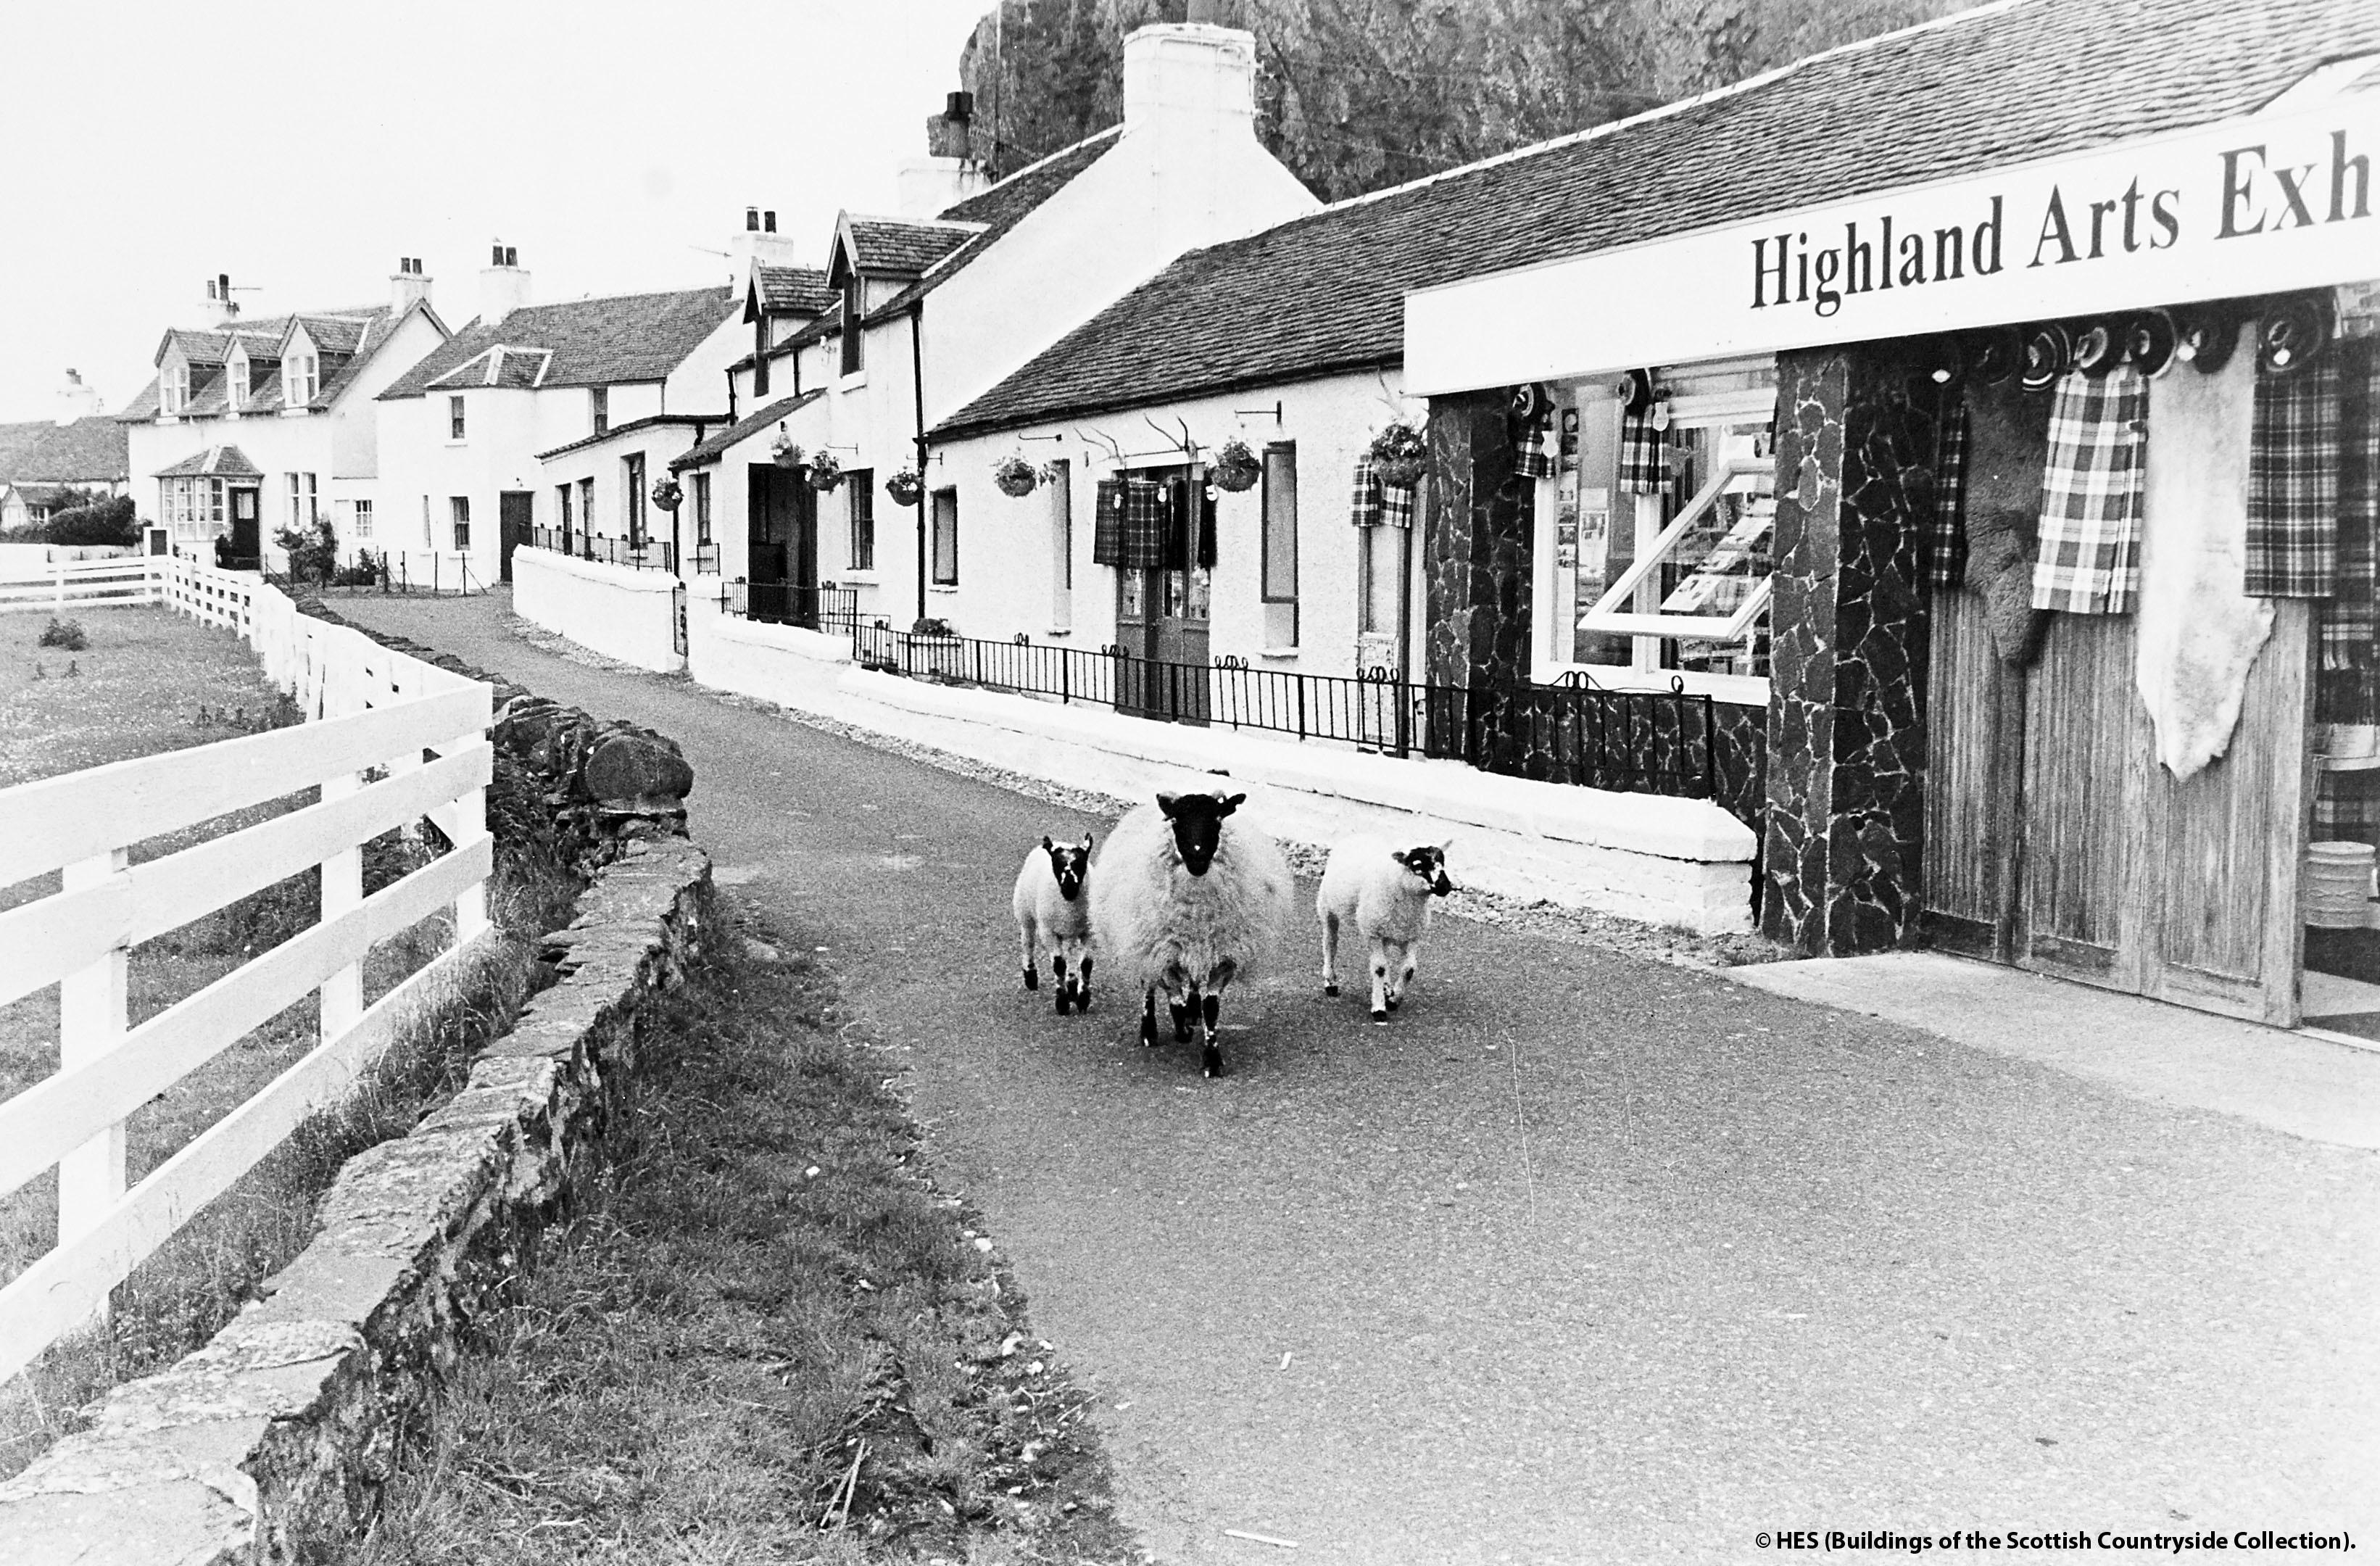 Sheep in Oban